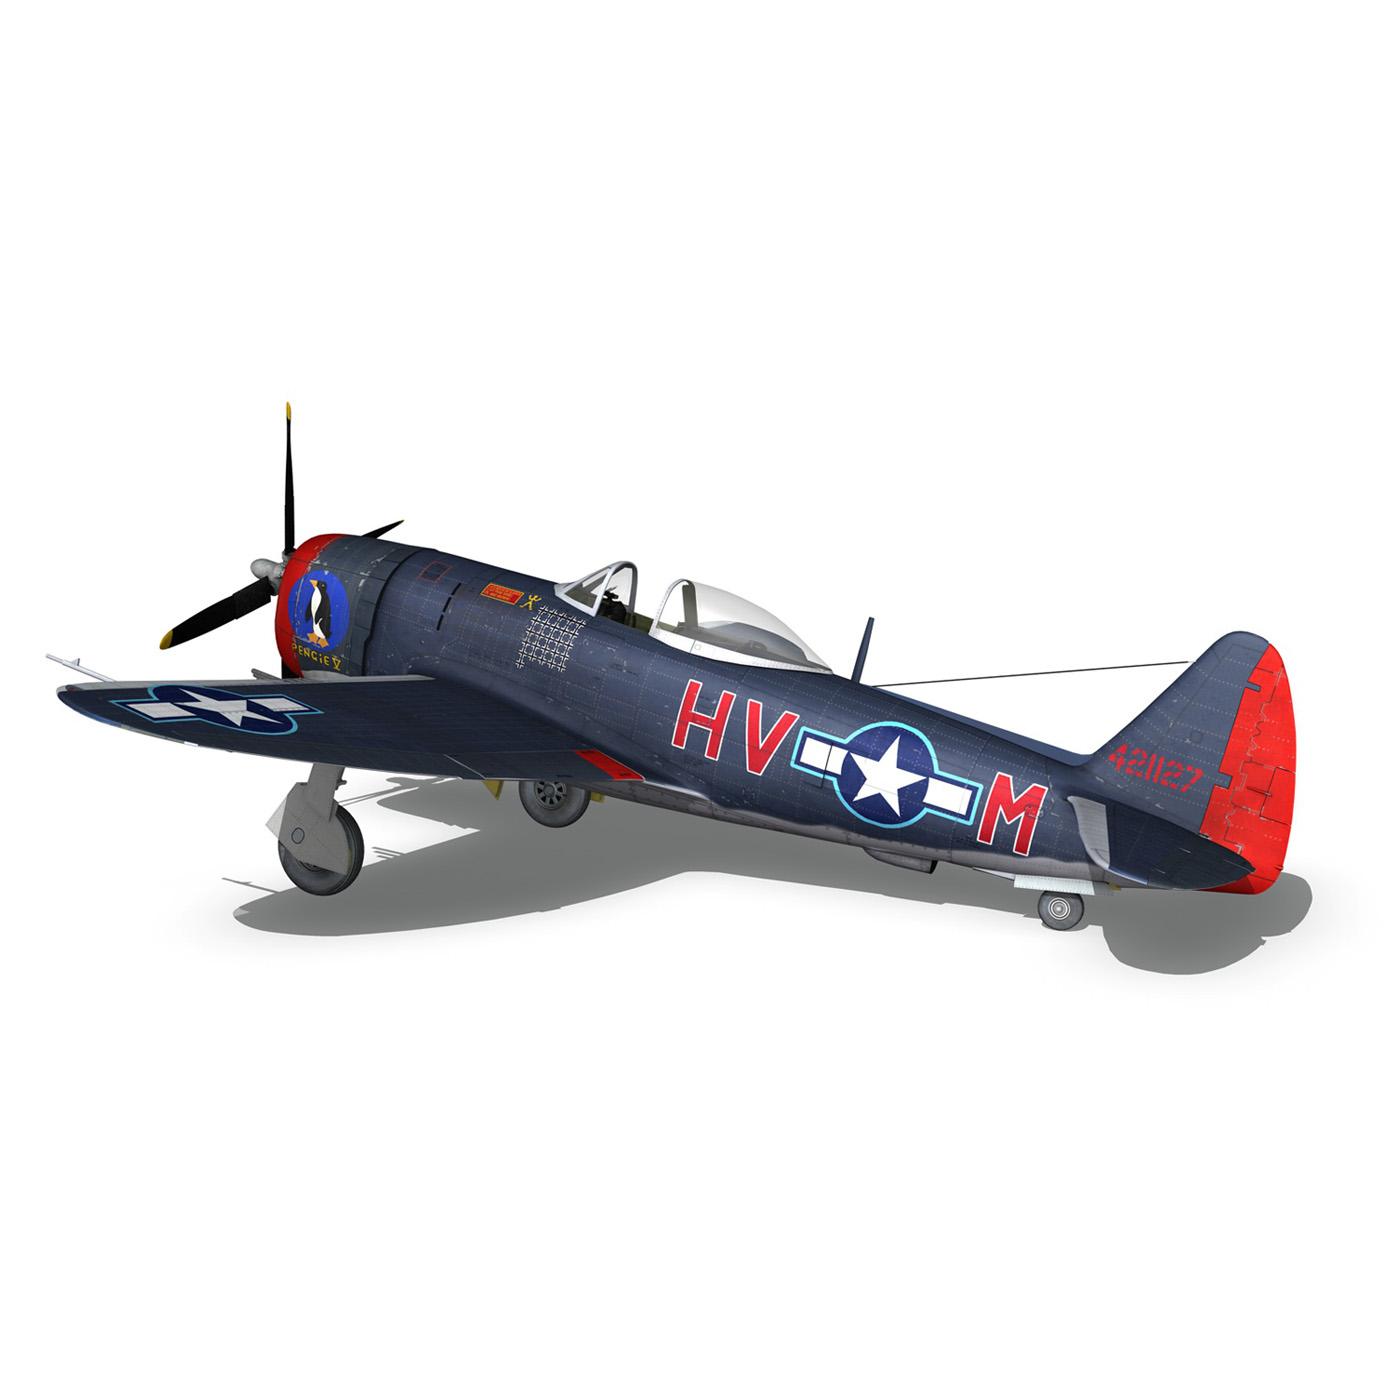 republic p-47m thunderbolt – pengie v 3d model 3ds c4d fbx lwo lw lws obj 279727